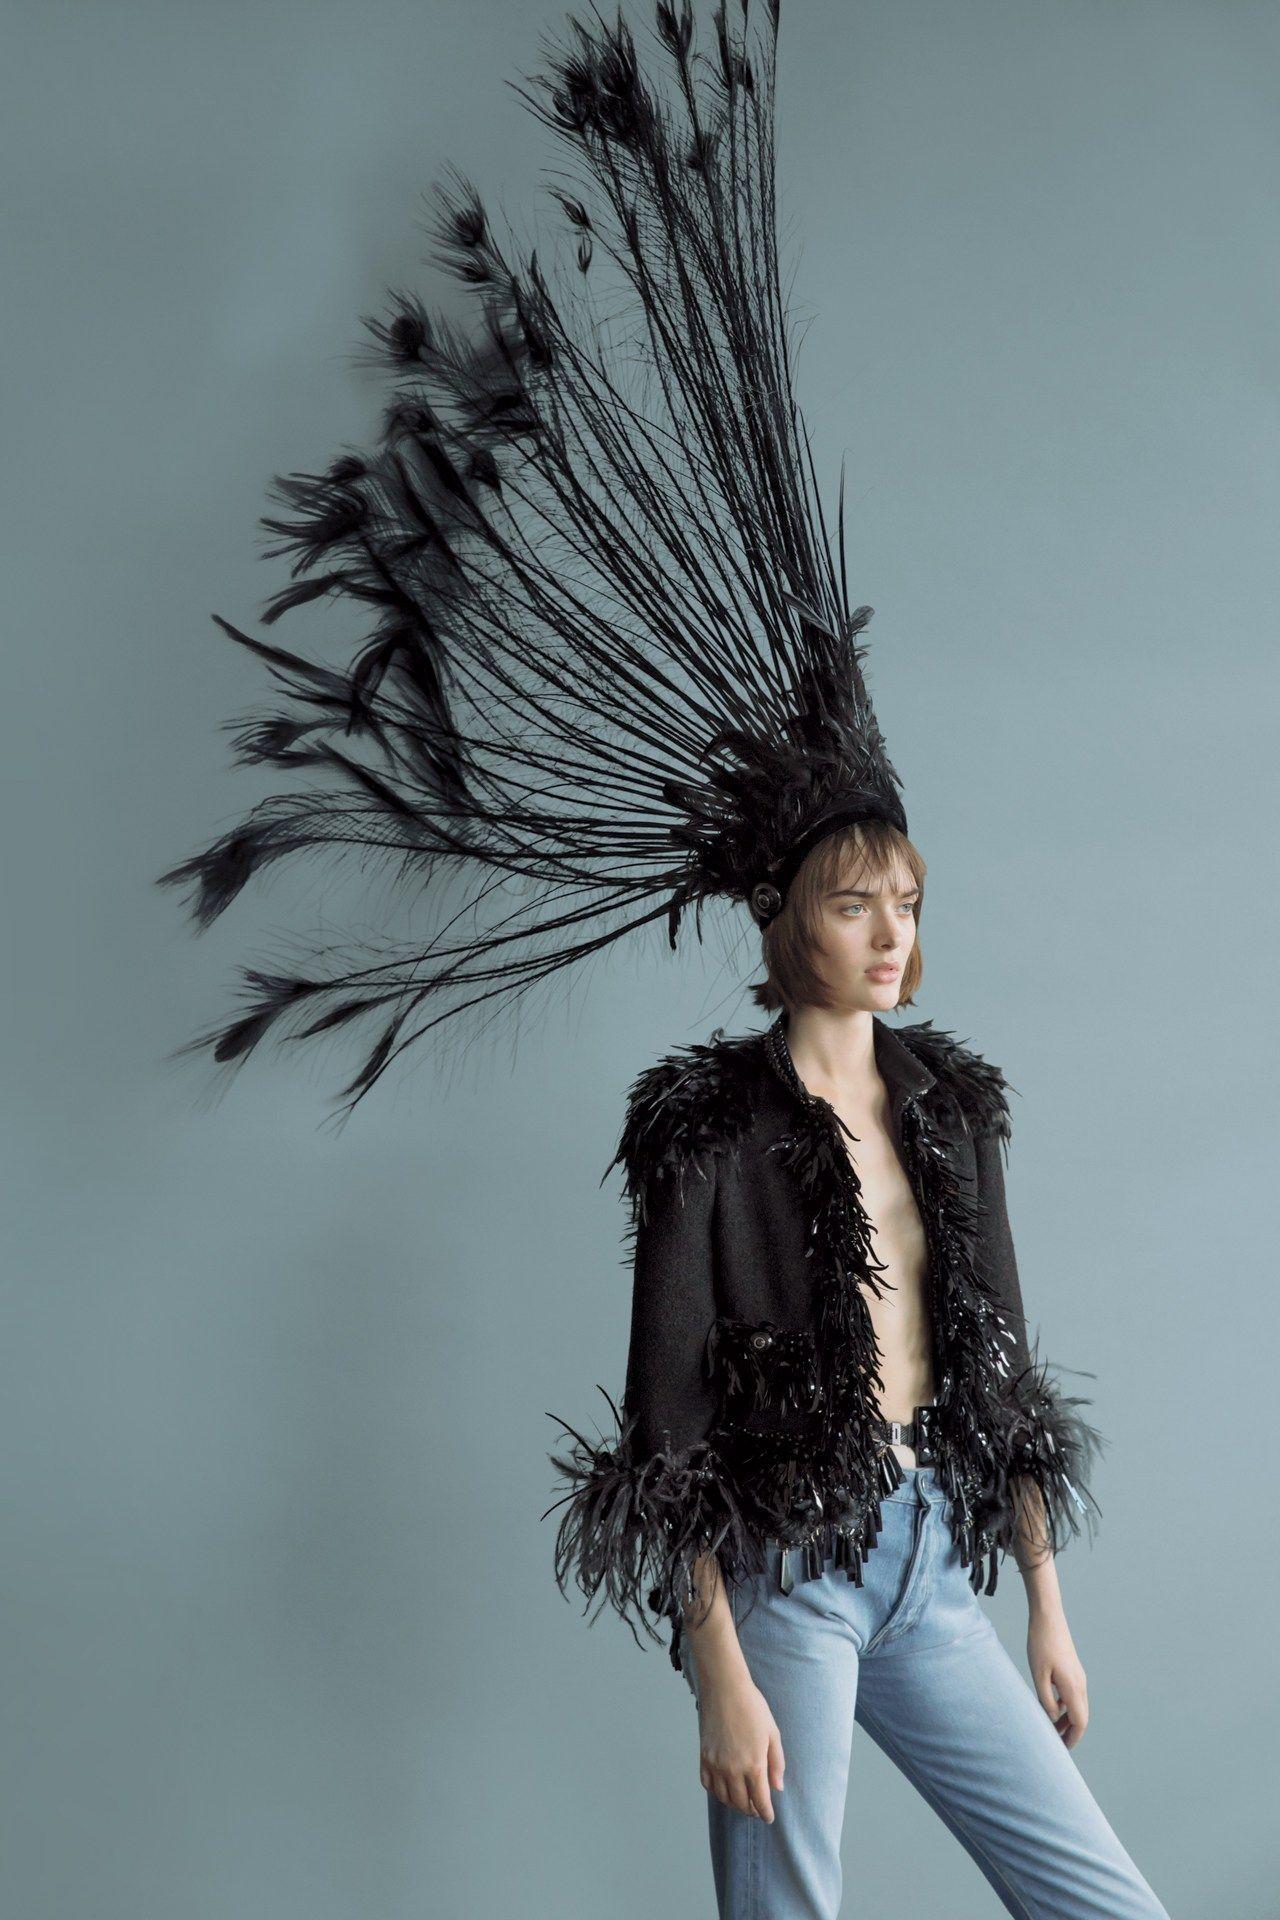 High Fashion photography | jackburns | Pinterest